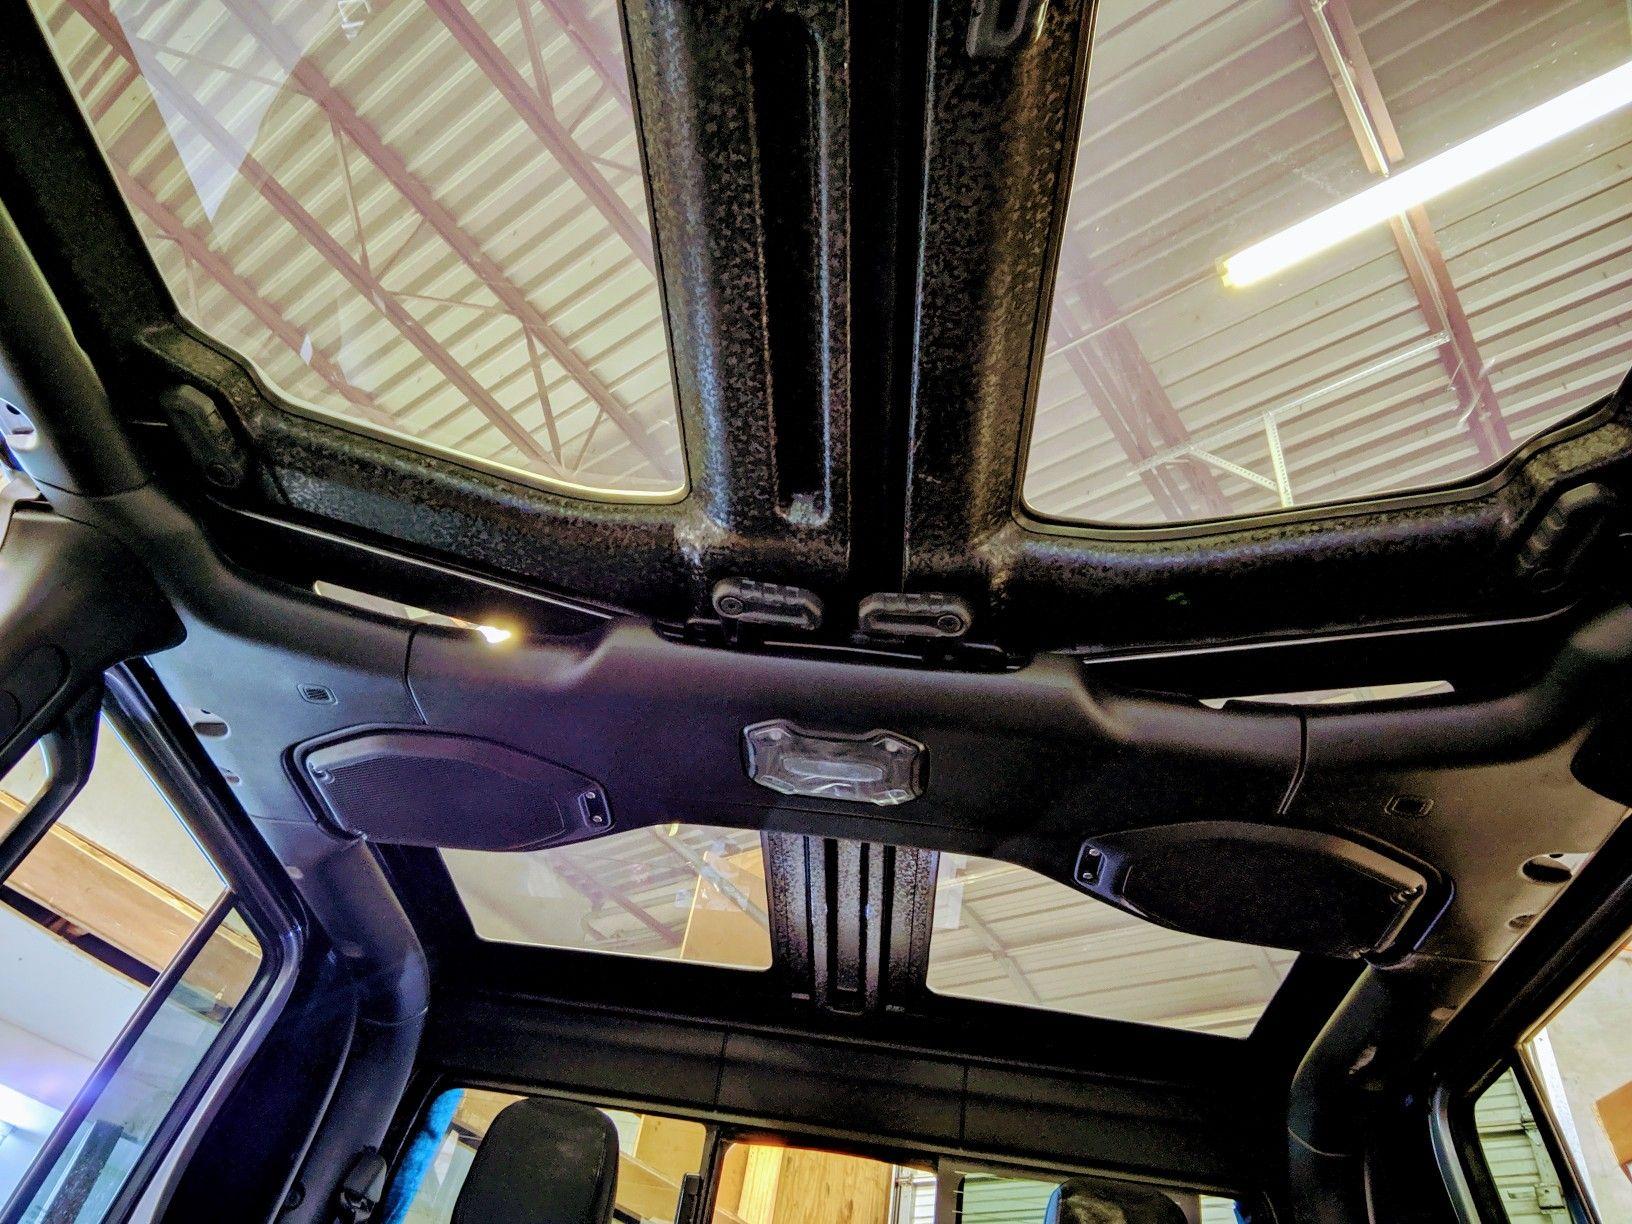 2018 2020 Jeep Wrangler Jl Gladiator Panoramic Hardtop Sunroof